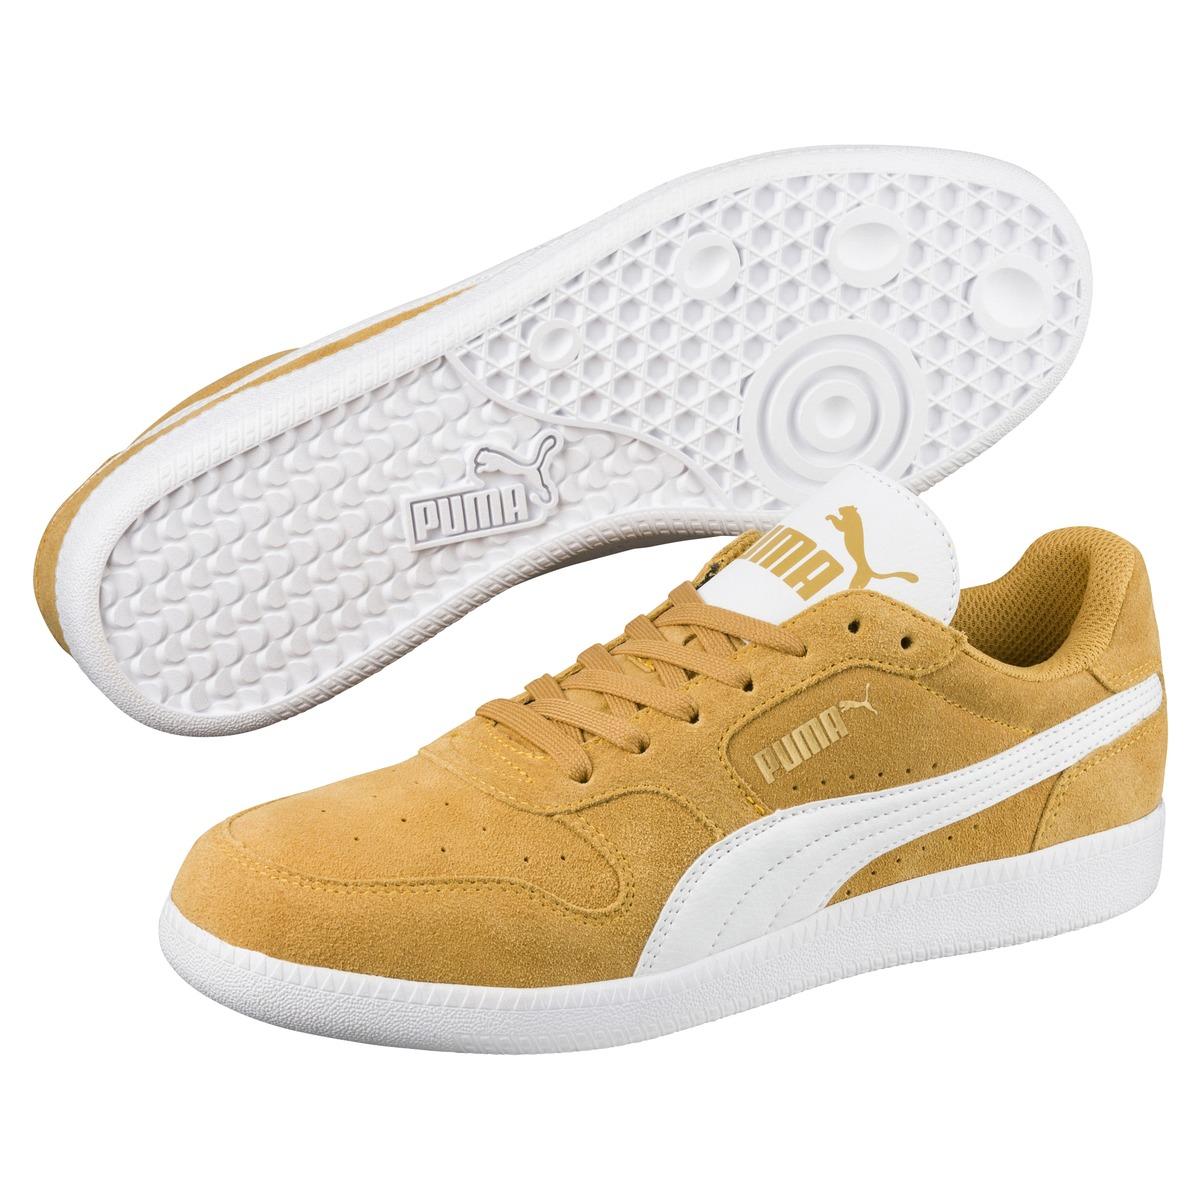 puma icra trainer sd sneaker